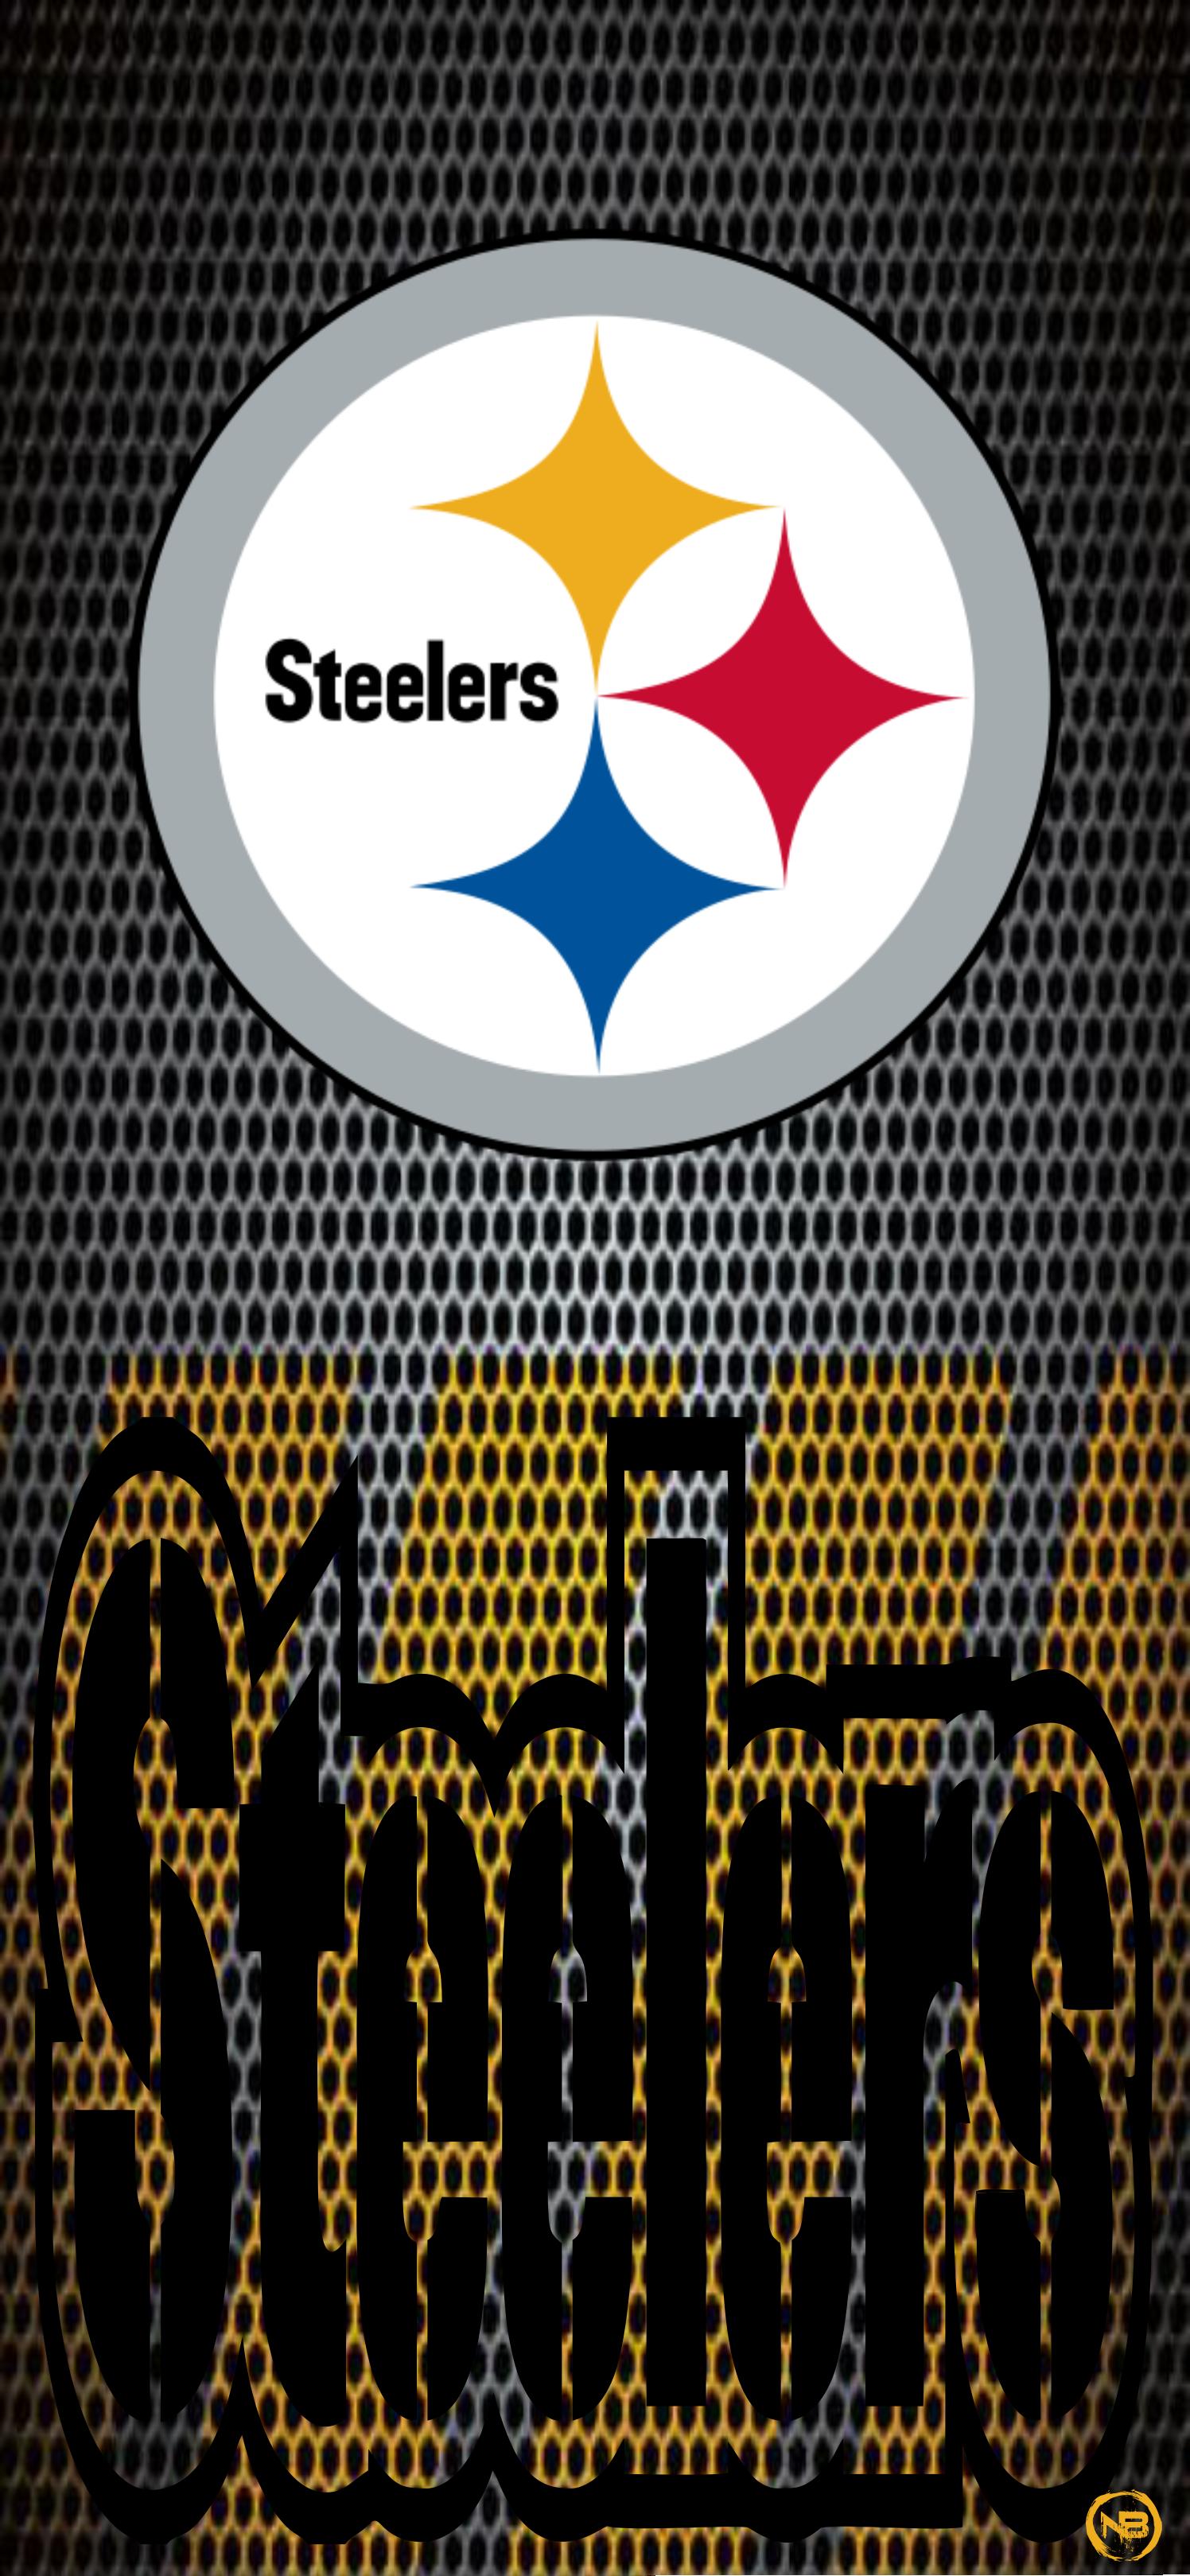 Pin By Carlos Falcon On Dccomics Pittsburgh Steelers Wallpaper Pittsburg Steelers Steelers Pics